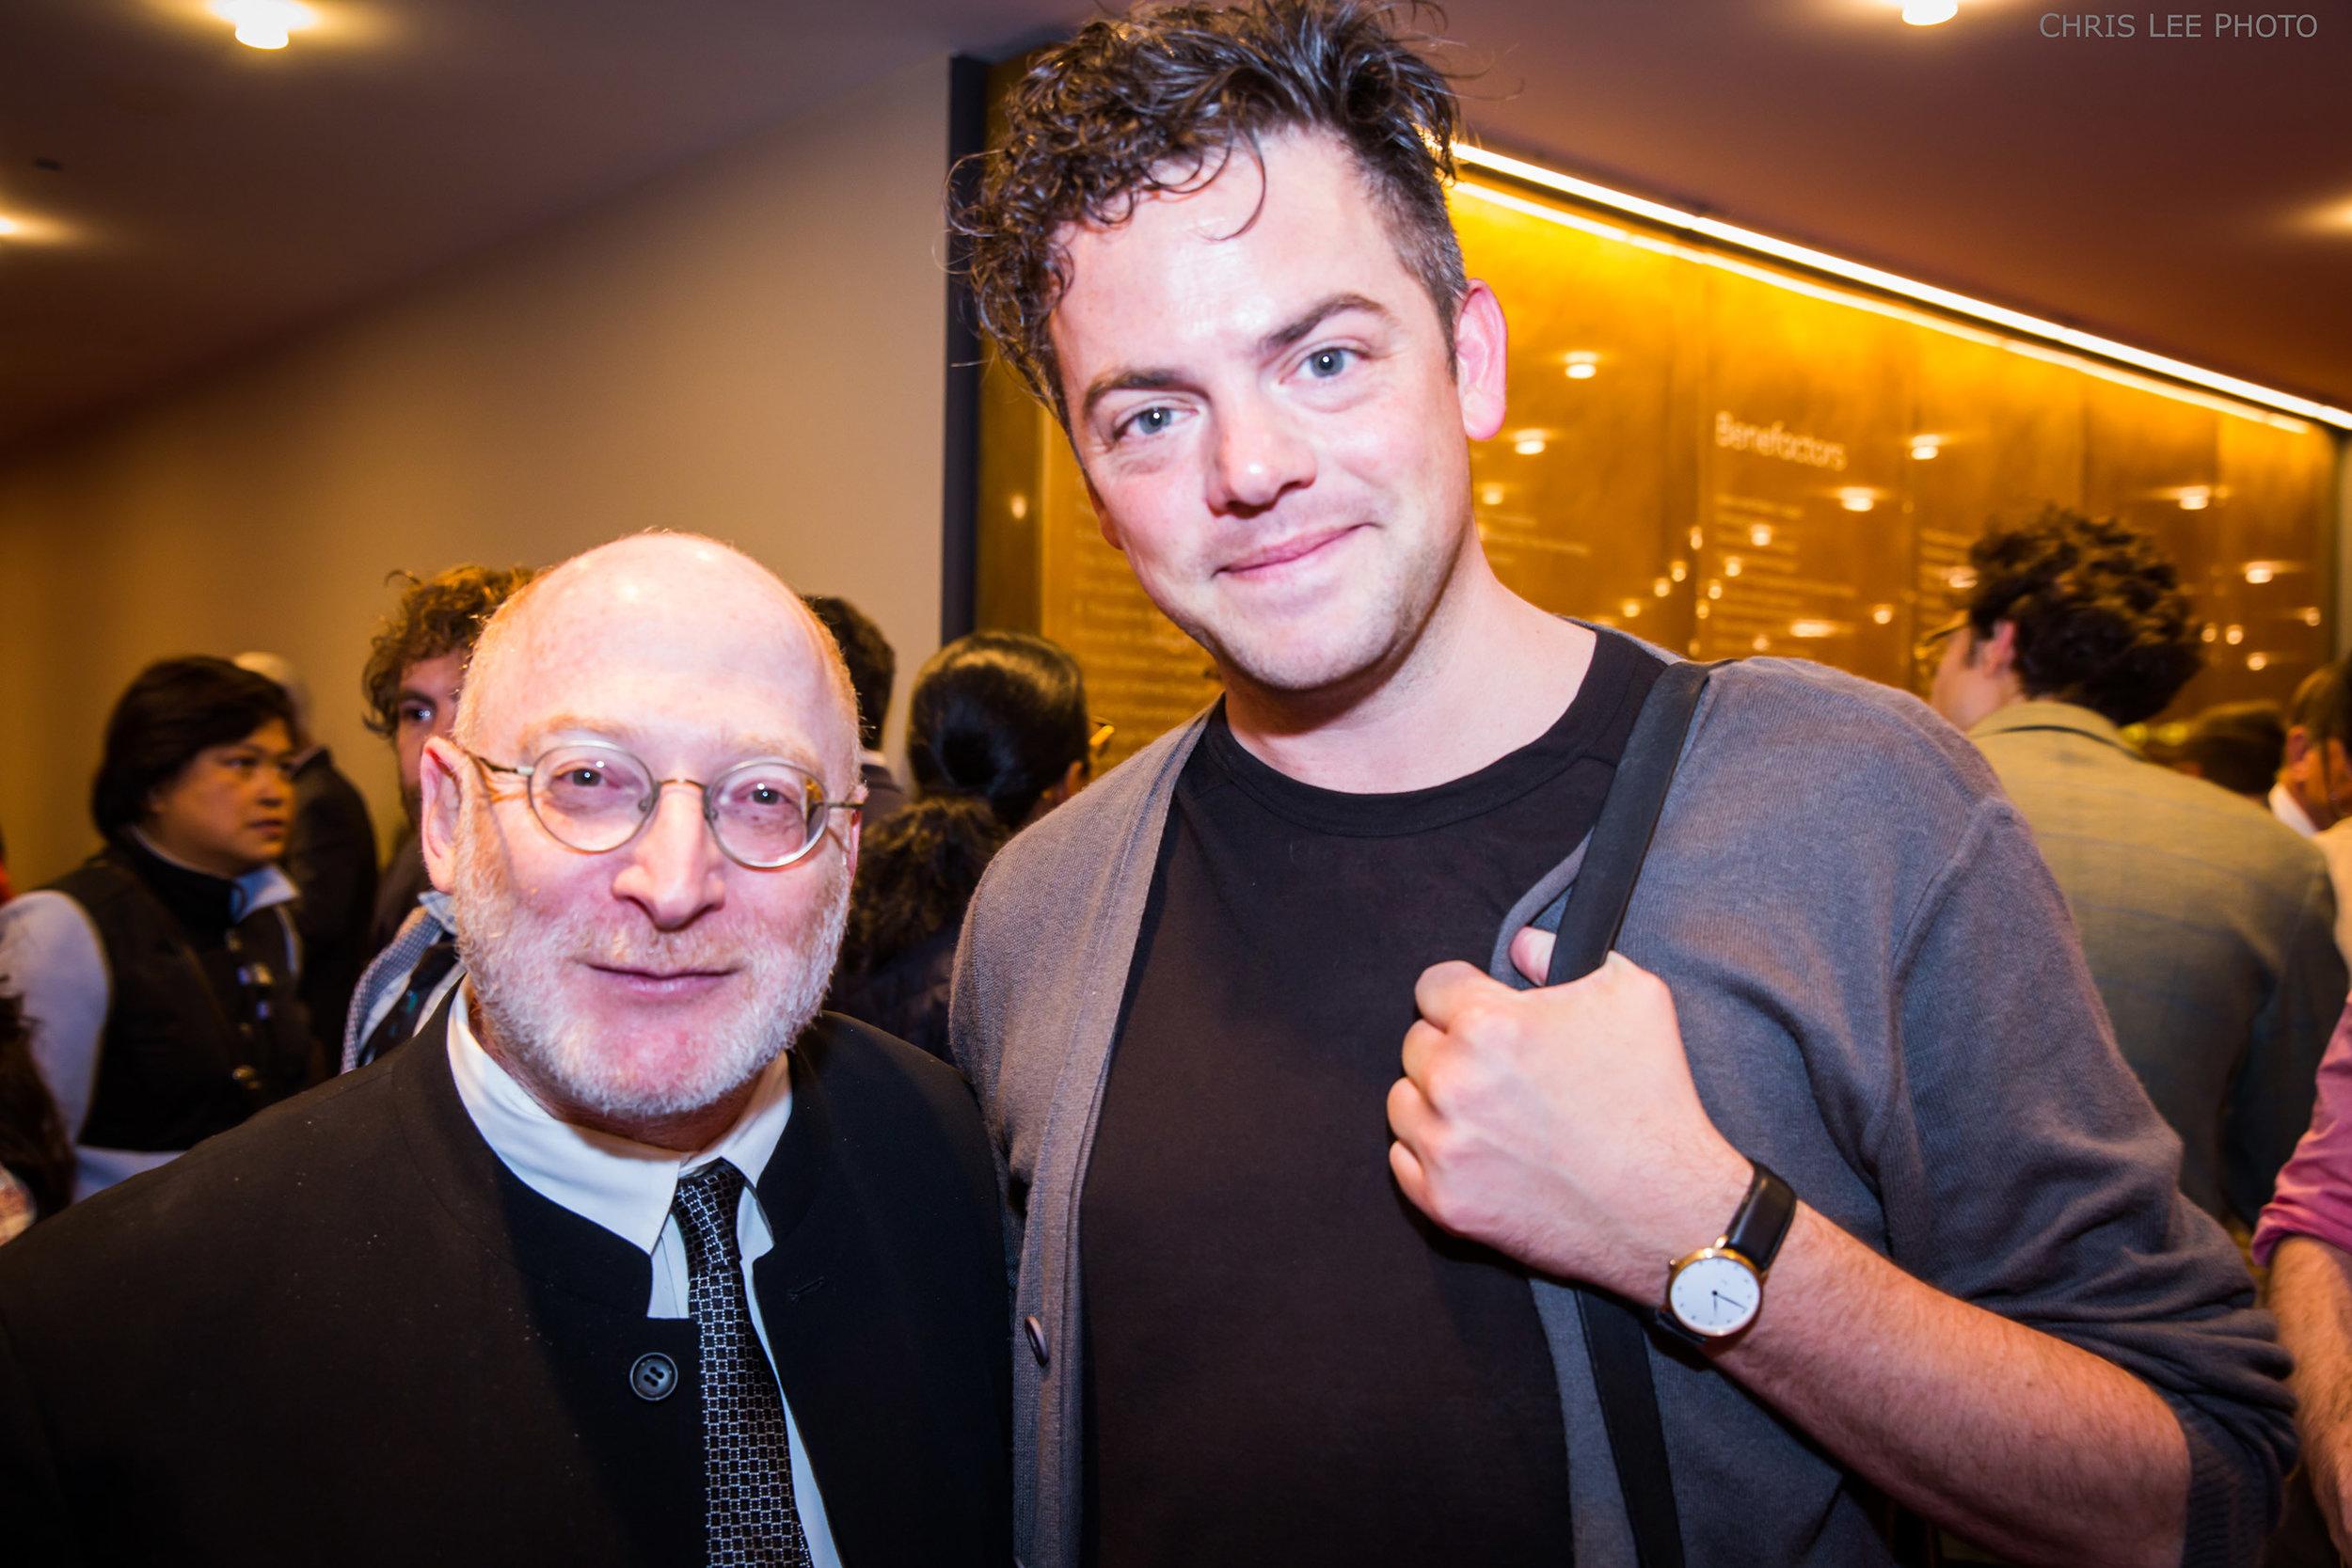 Aaron Jay Kernis (left). Photograph courtesy New York Philharmonic, Chris Lee Photographer.